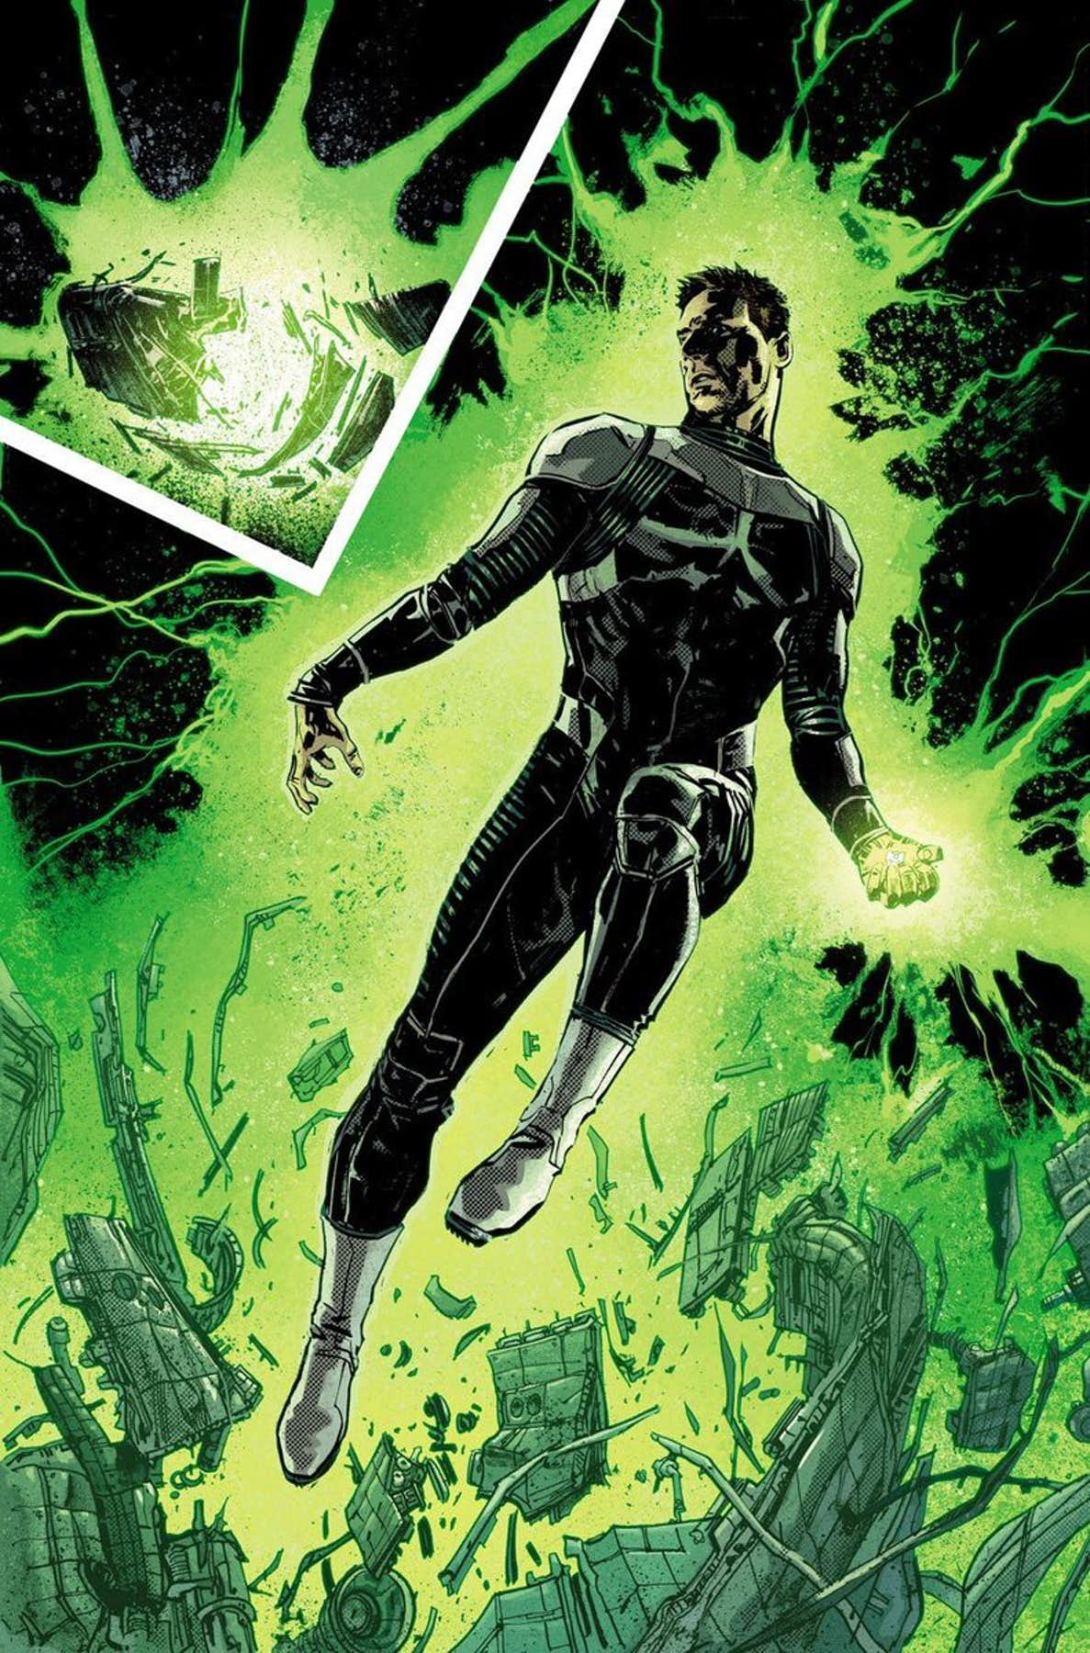 Green Lantern Earth One 3 - DC Comics News